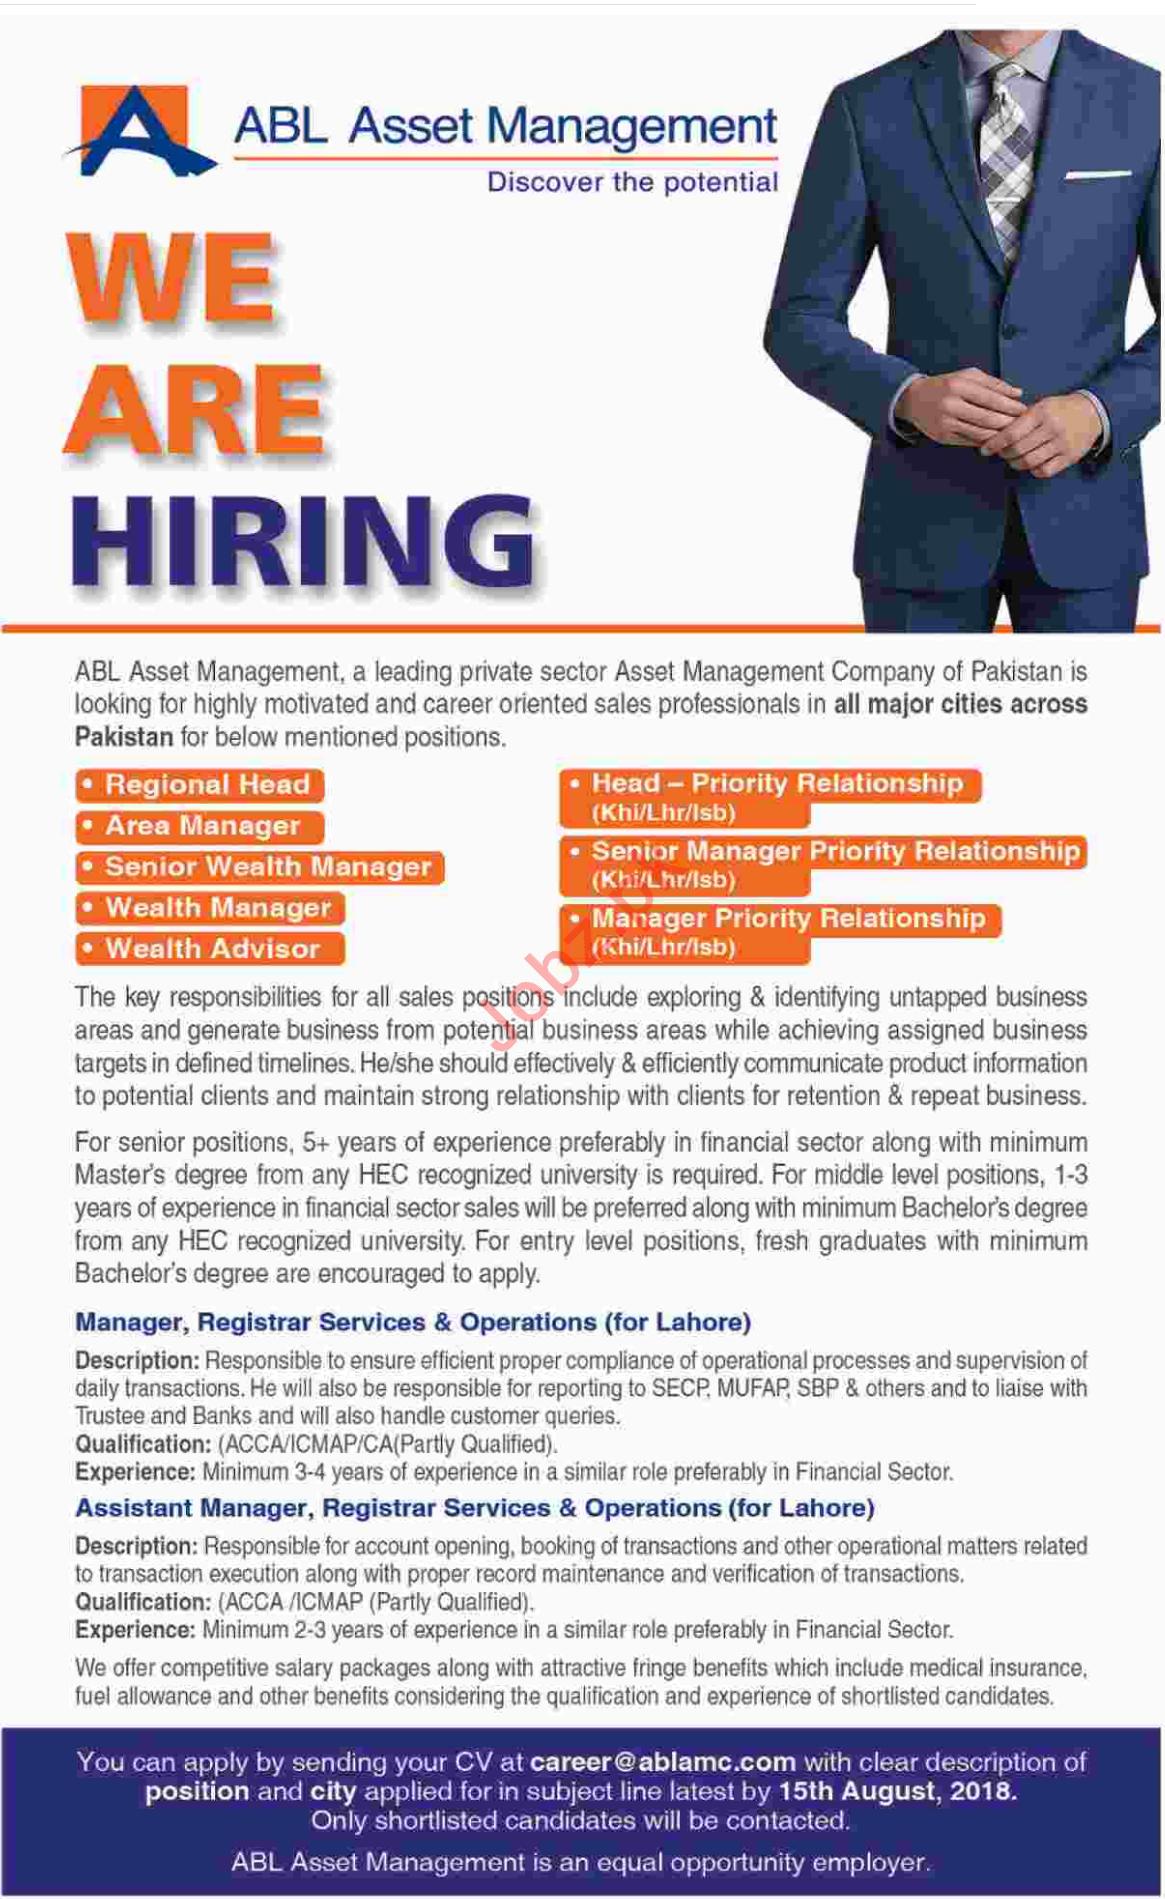 Jobs at ABL Asset Management Company